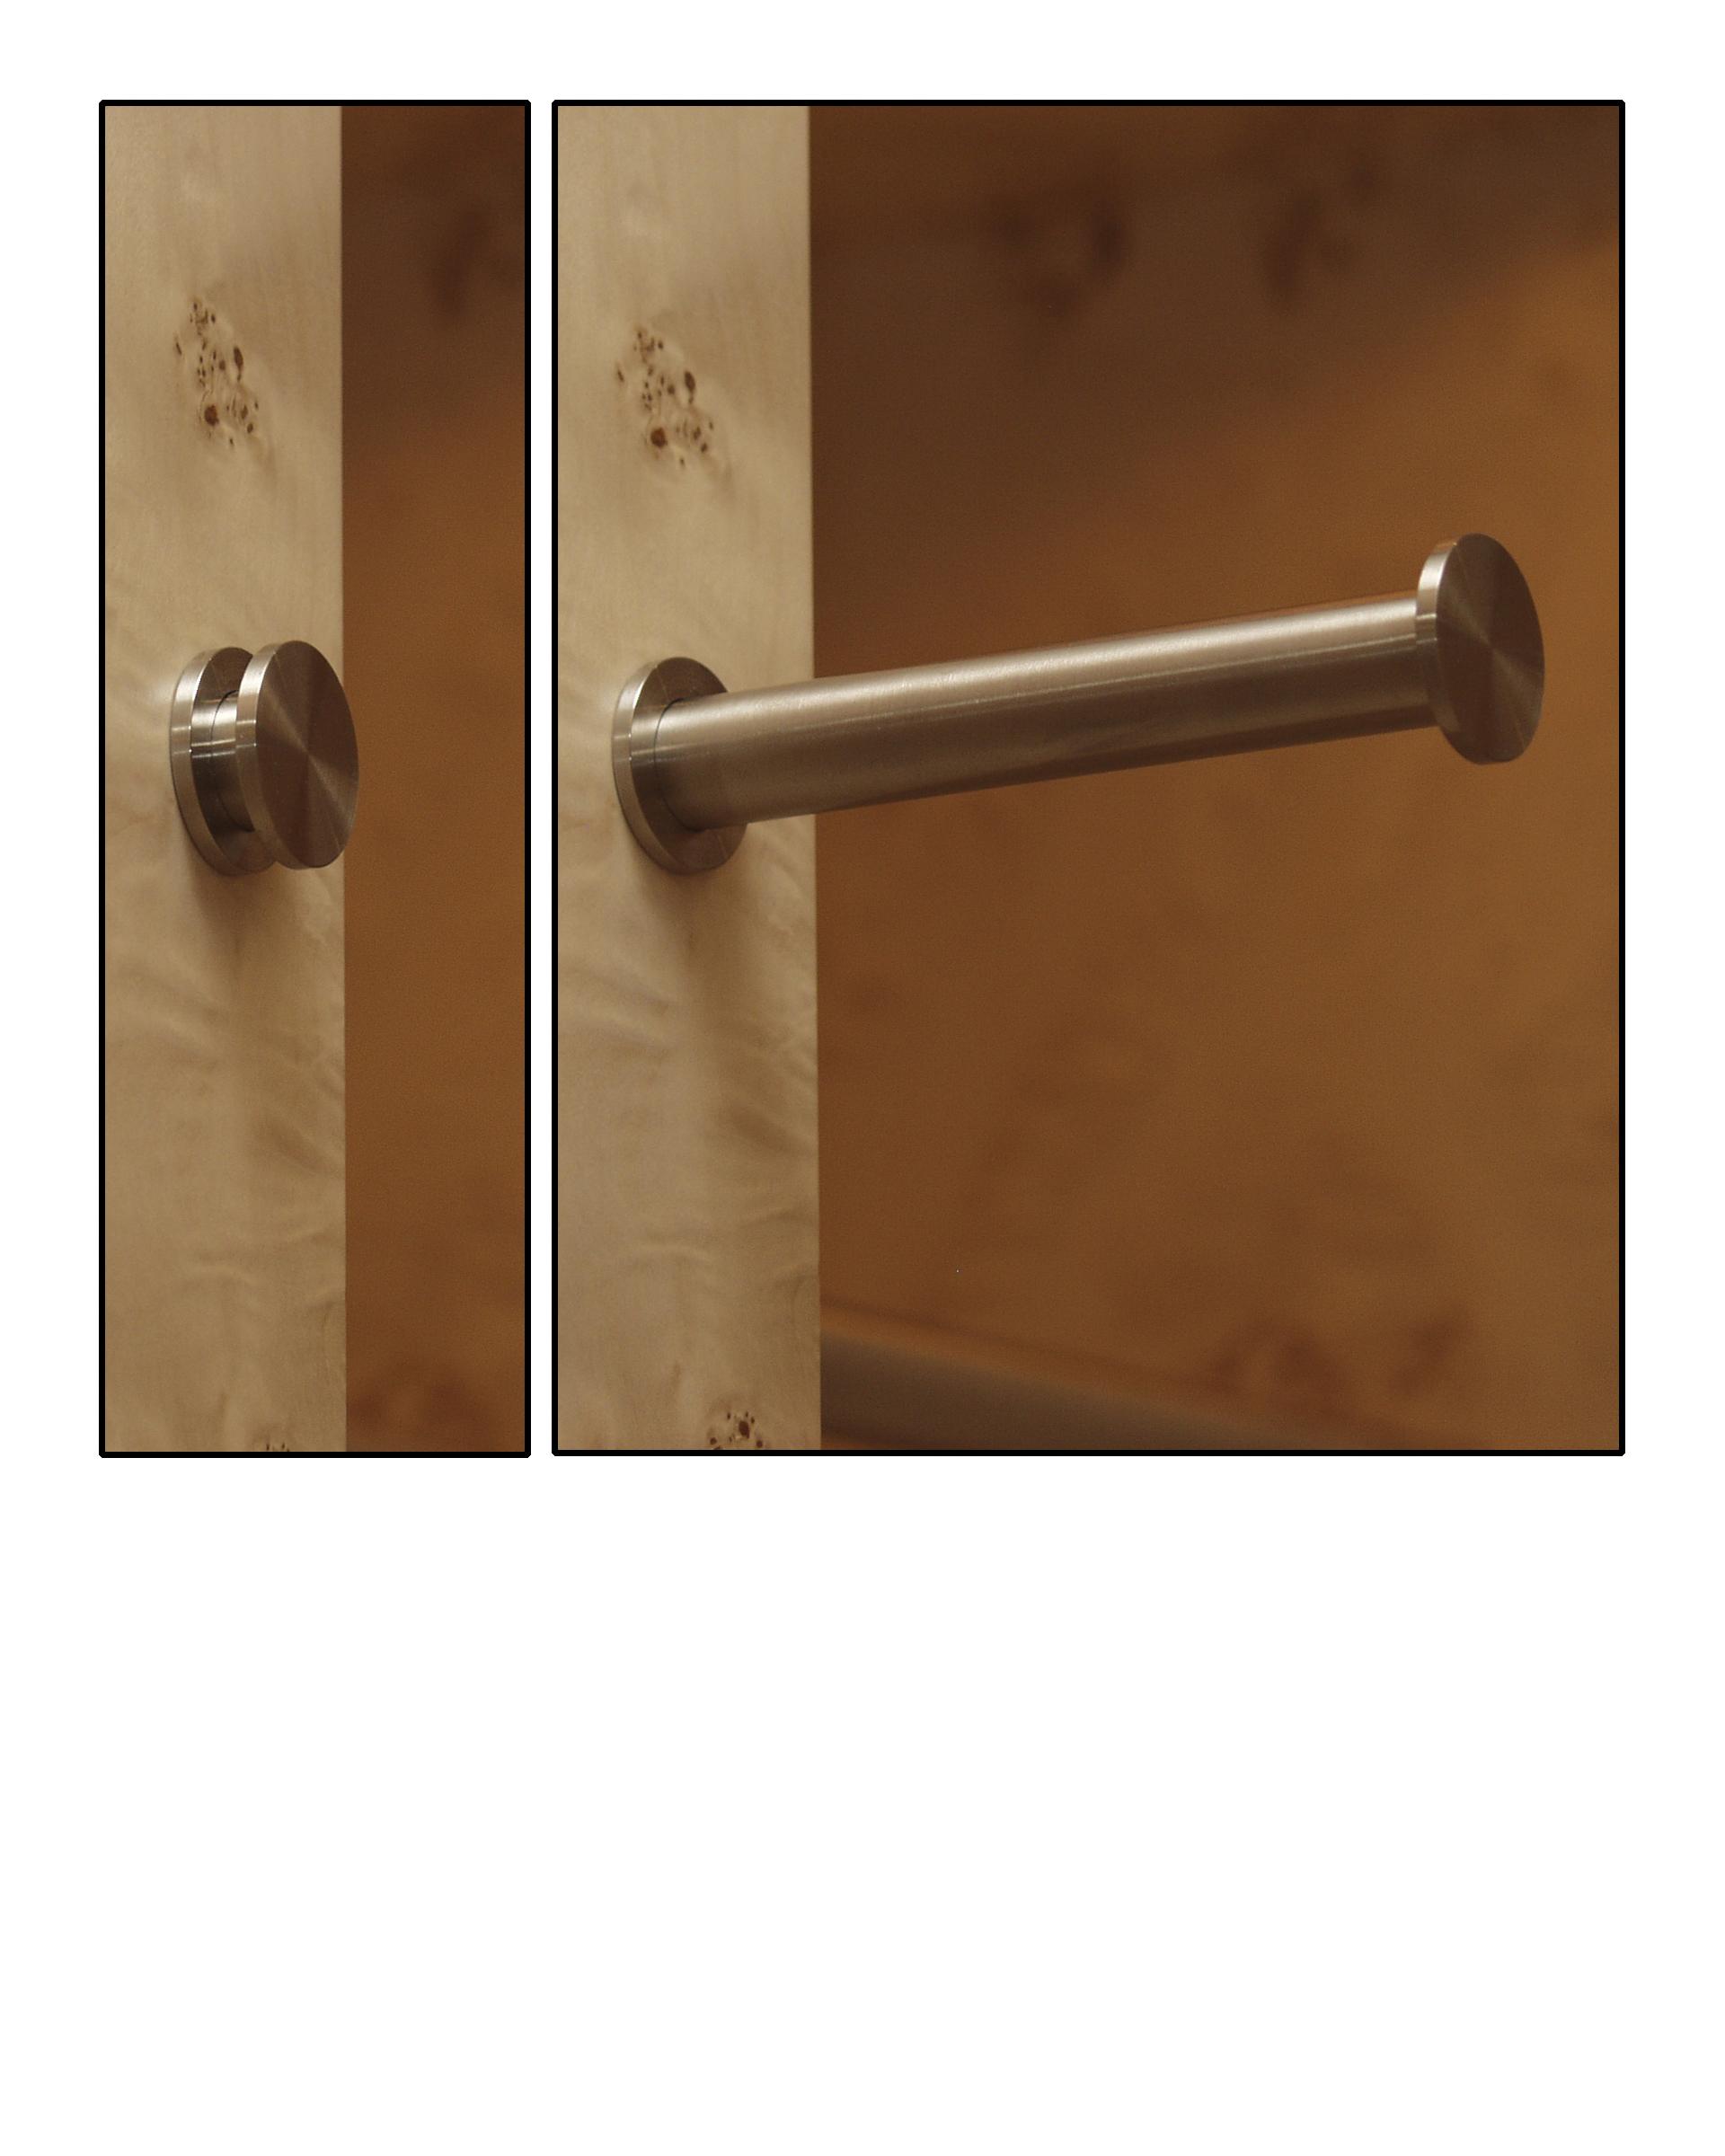 Satin Nickel Closet Rod Pullout